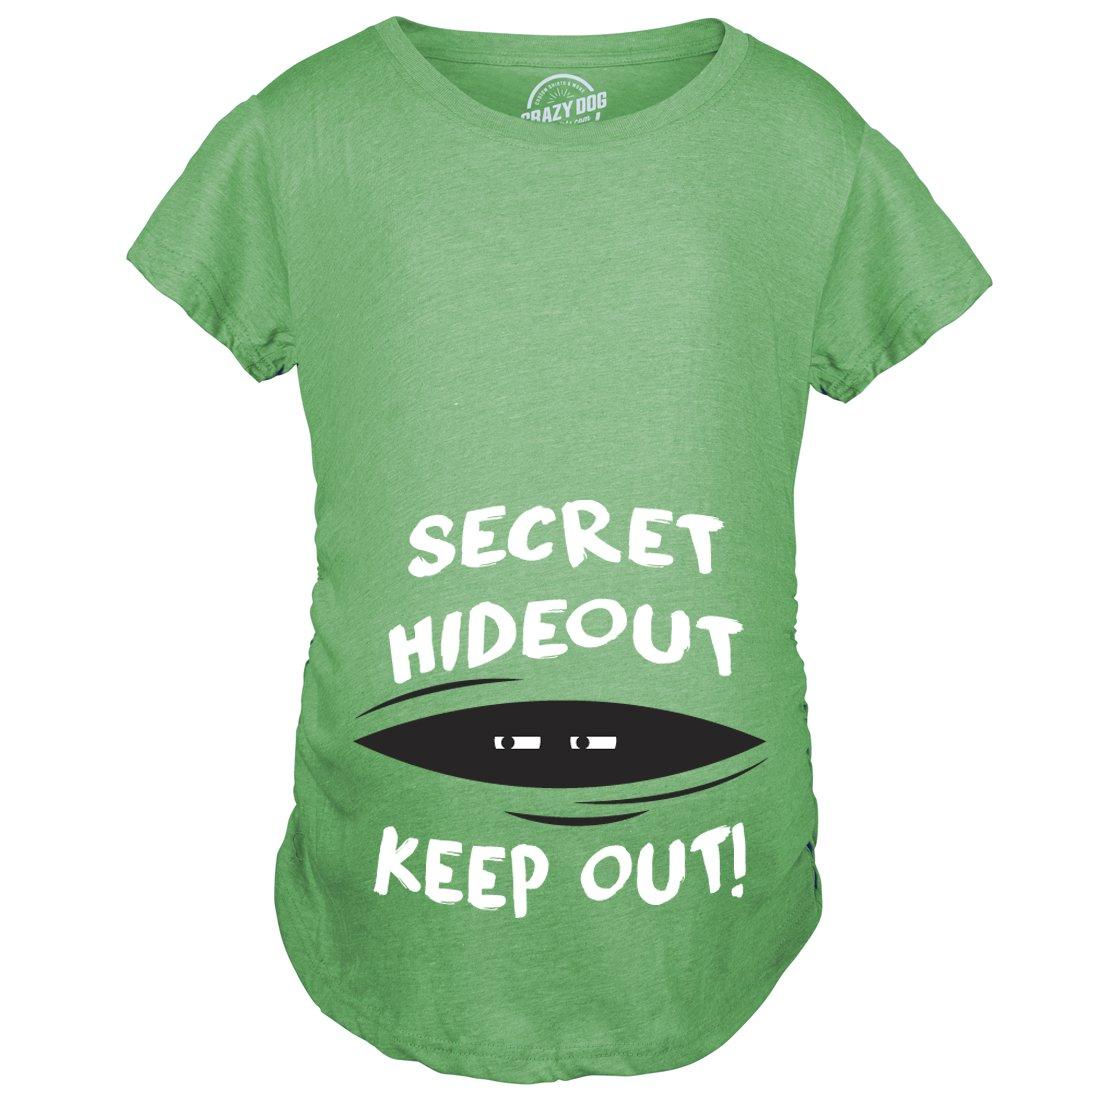 Maternity Secret Hideout Baby Peeking Maternity Shirt Funny Pregnancy Shirts (Green) L